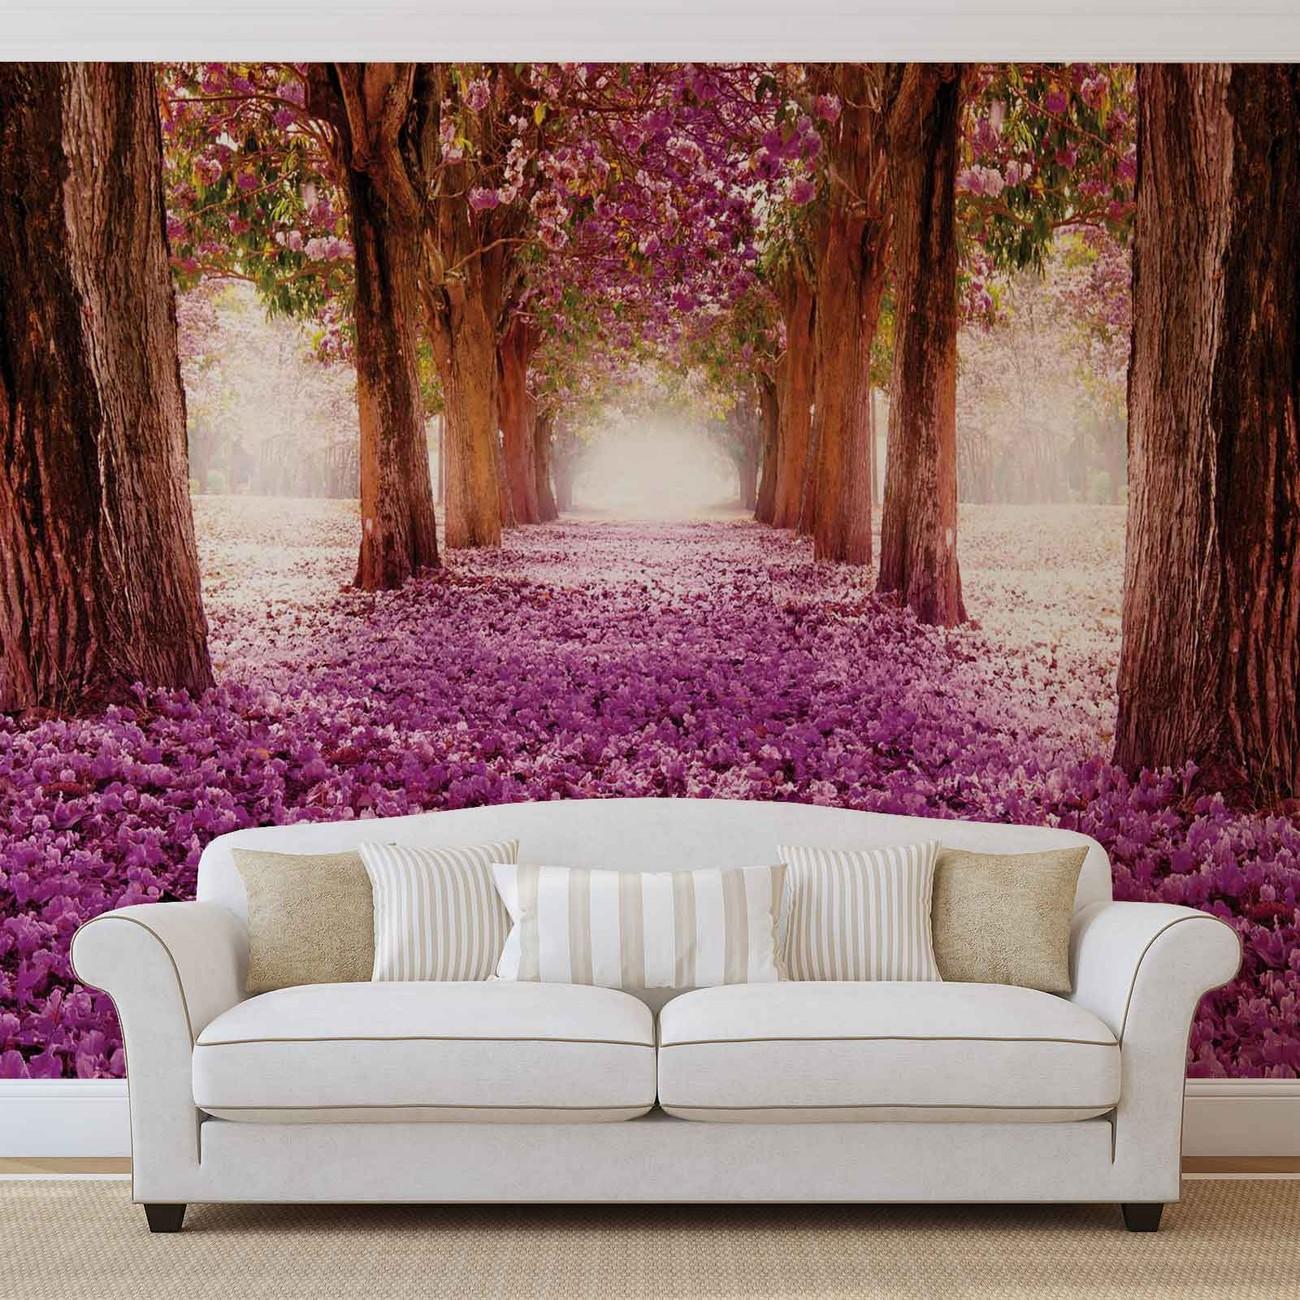 chemin dans les arbres en fleur rose poster mural papier. Black Bedroom Furniture Sets. Home Design Ideas